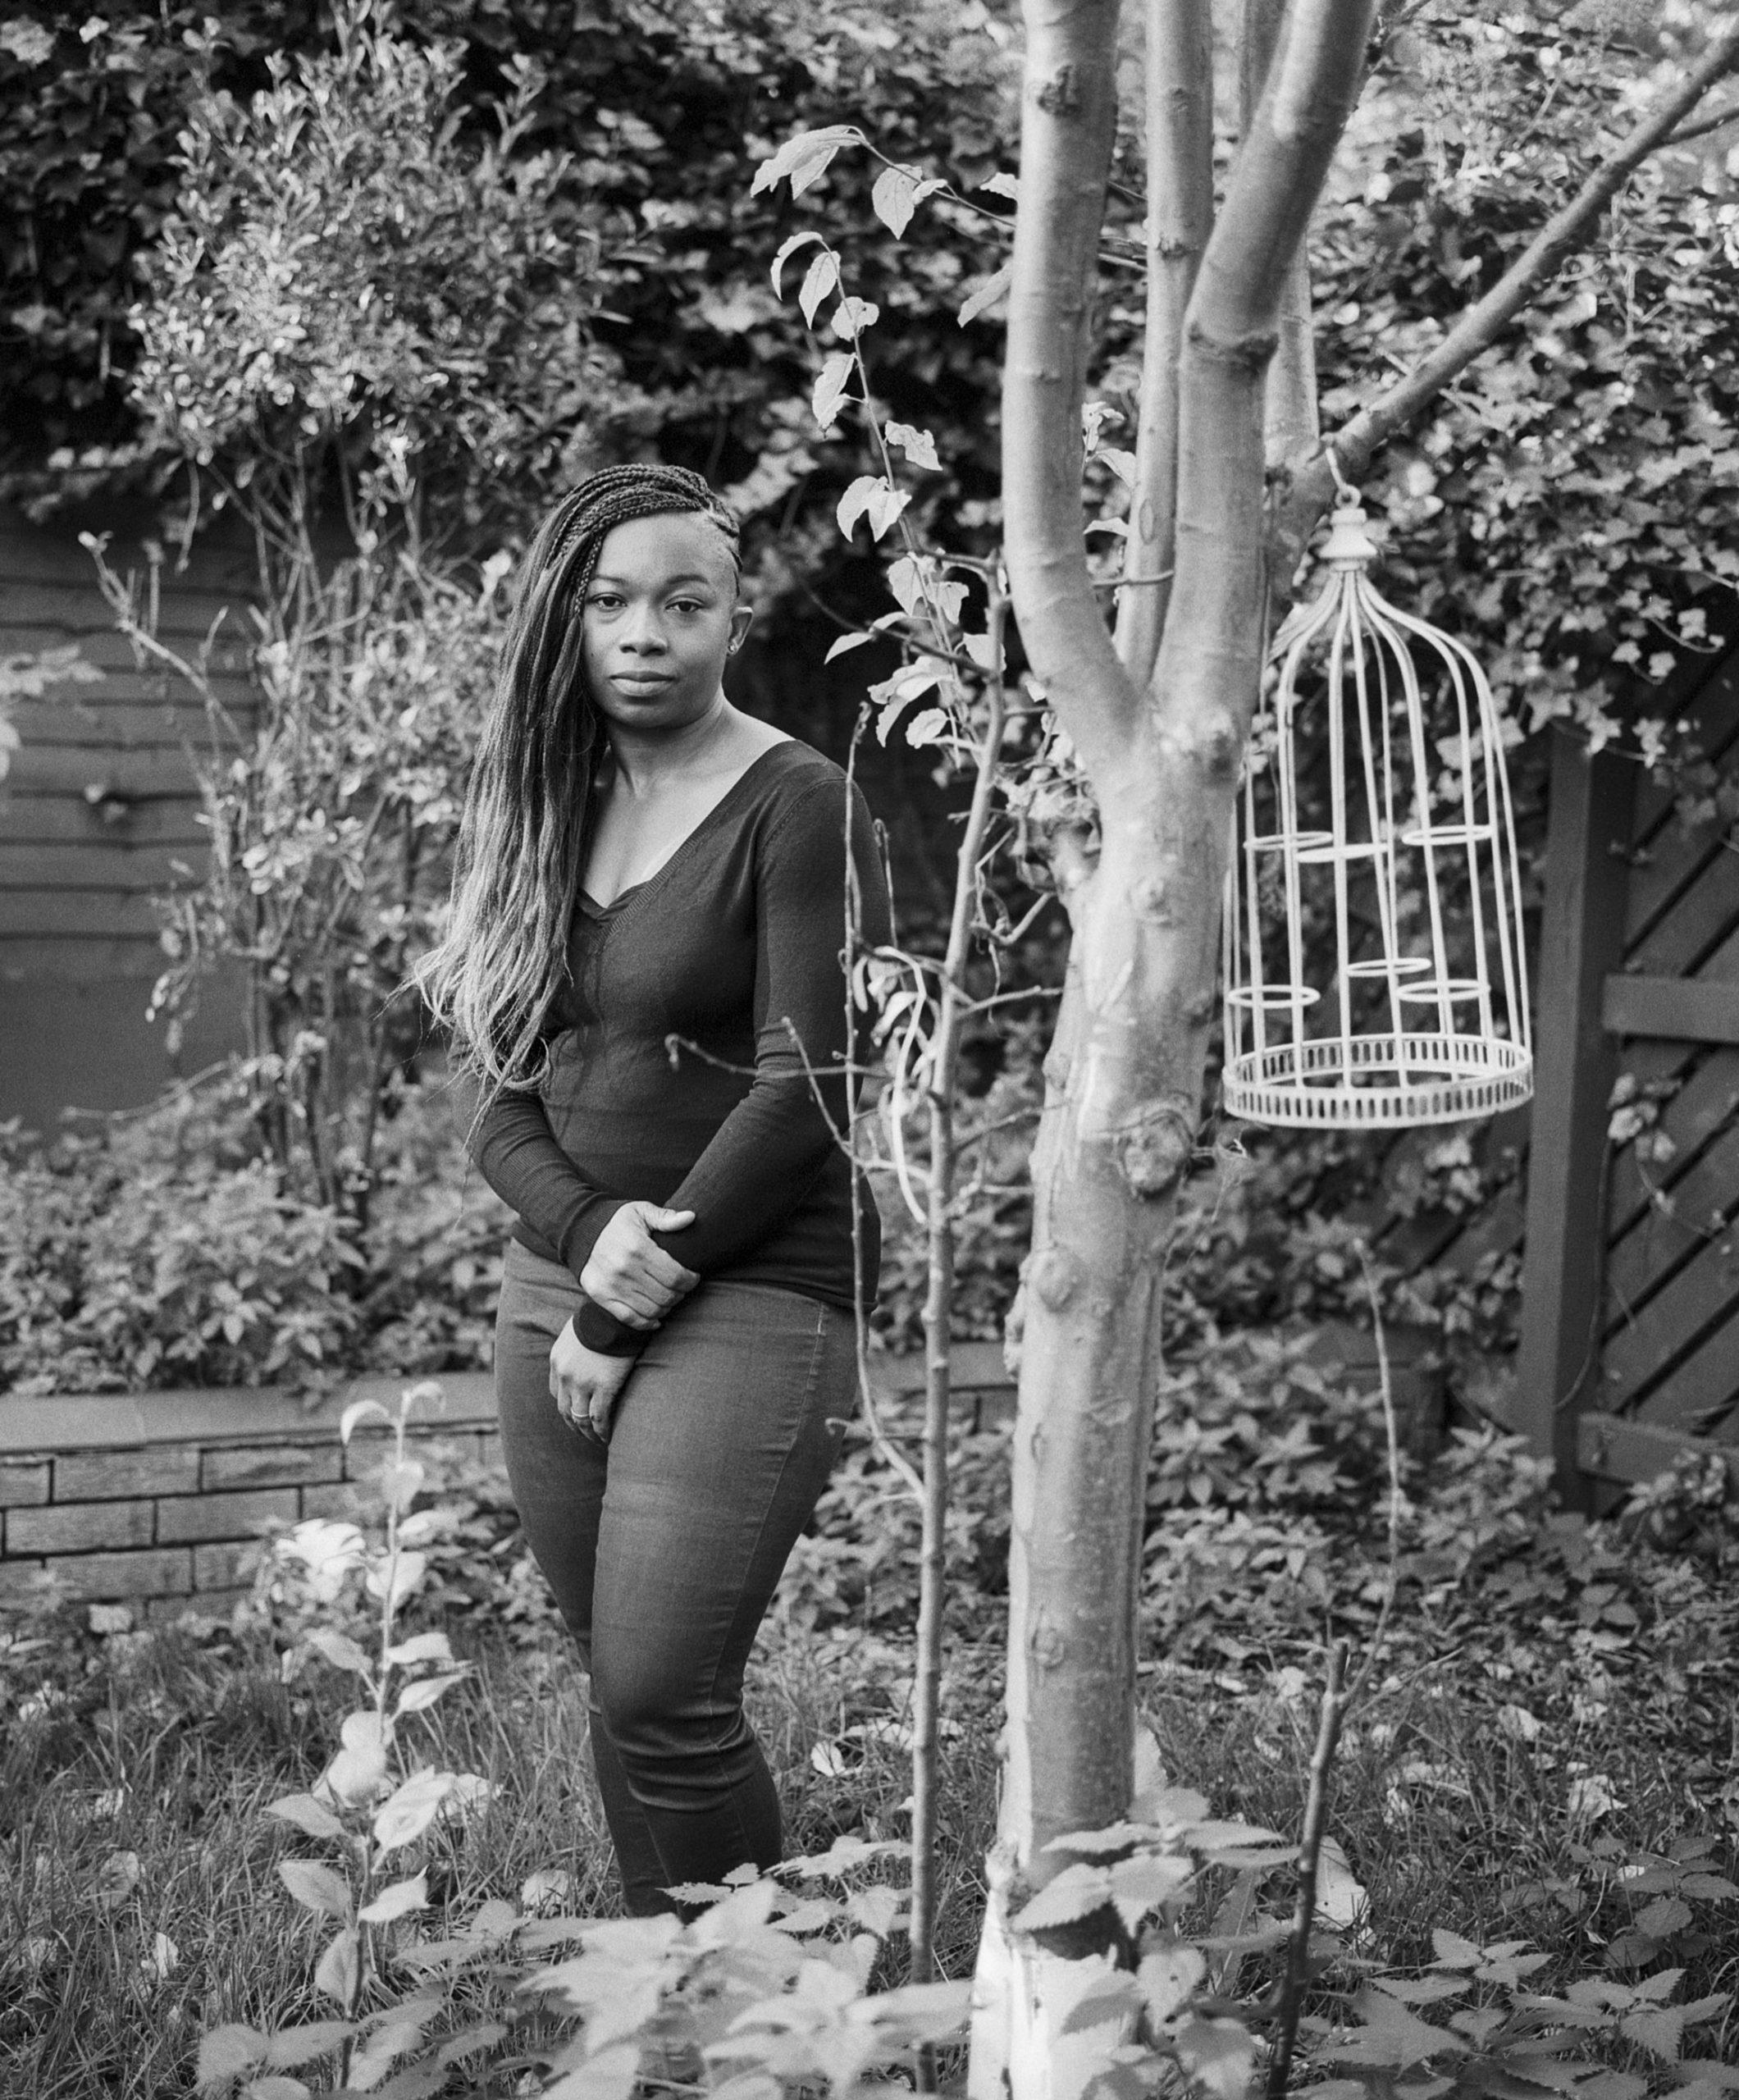 Abi-IOD-©ioanamarinca shot on ILFORD HP5 PLUS black and white film